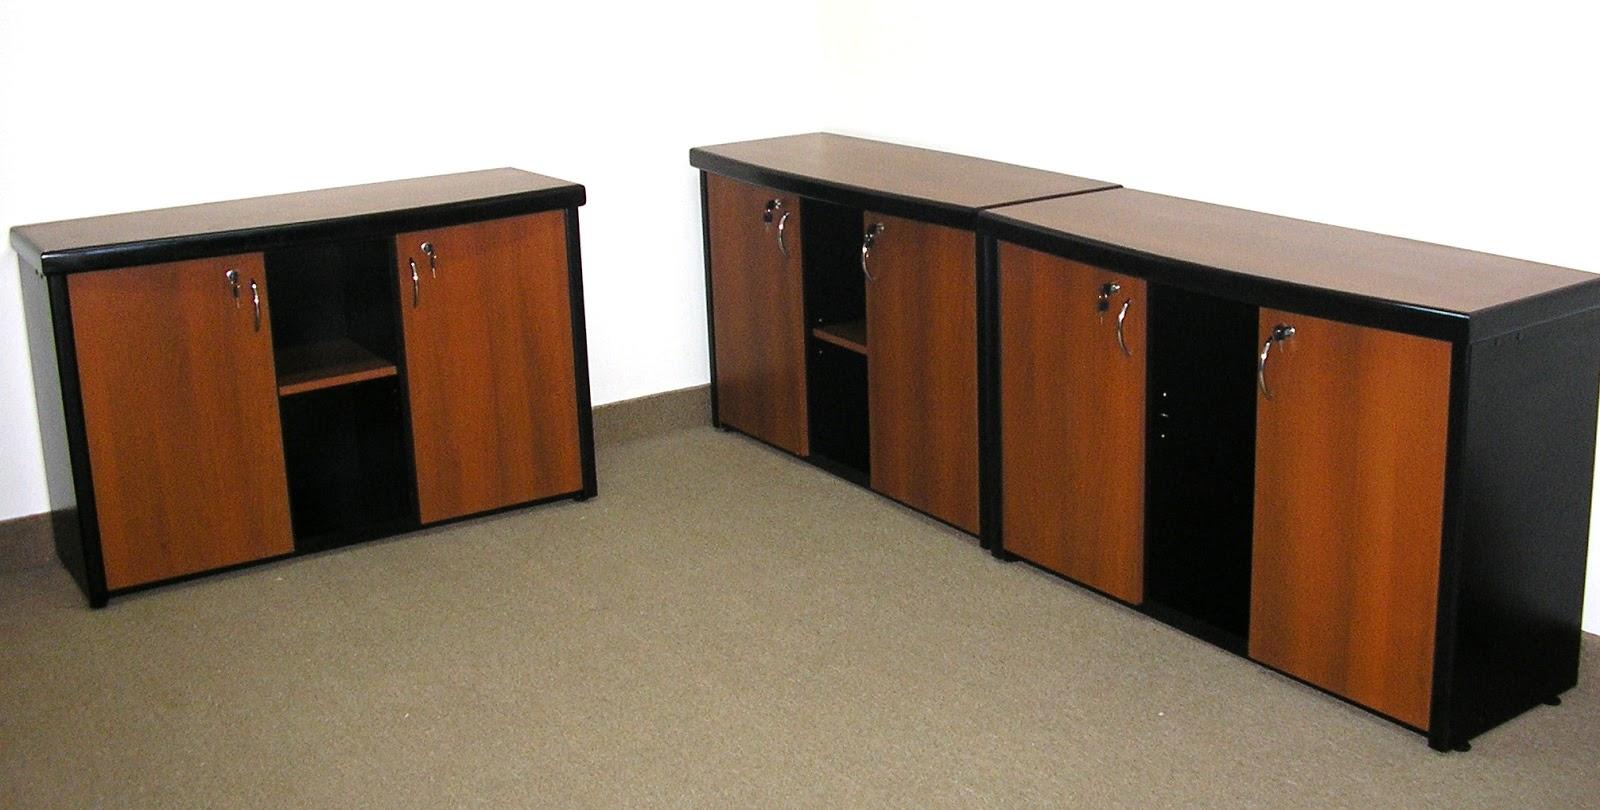 Muebles posadas misiones obtenga ideas dise o de muebles for Muebles de oficina usados olx